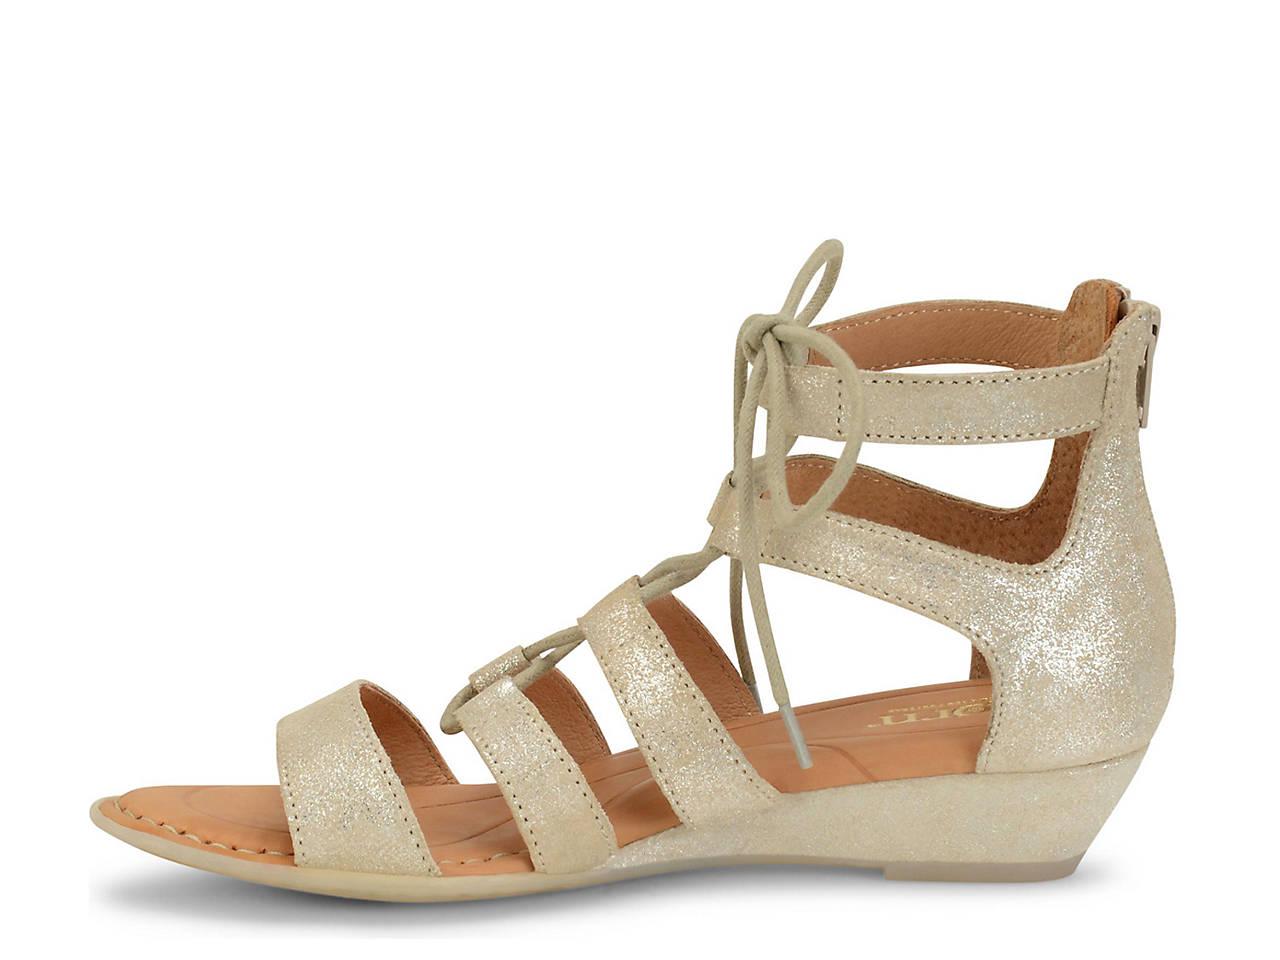 2a683cc4977 Born Dakar Wedge Sandal Women s Shoes